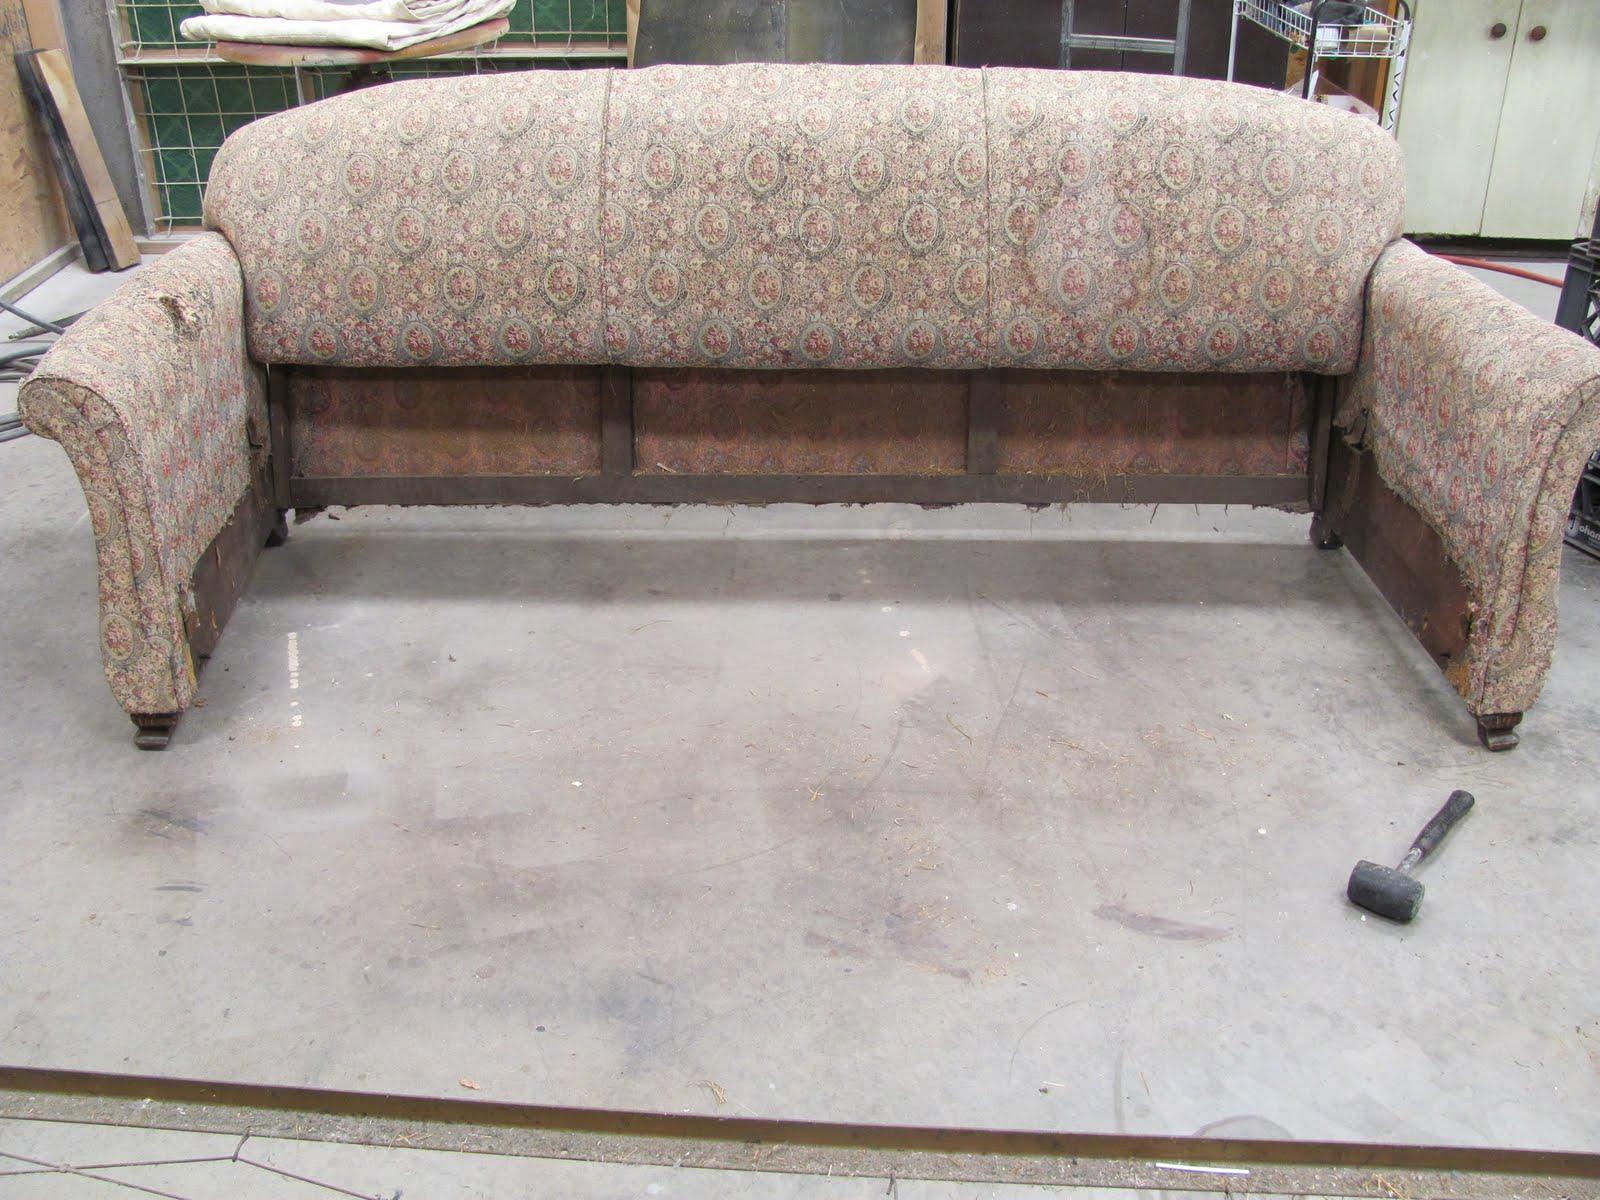 Thomas Nelson Furniture Restoration: Antique Sleeper Sofa Frame Repair